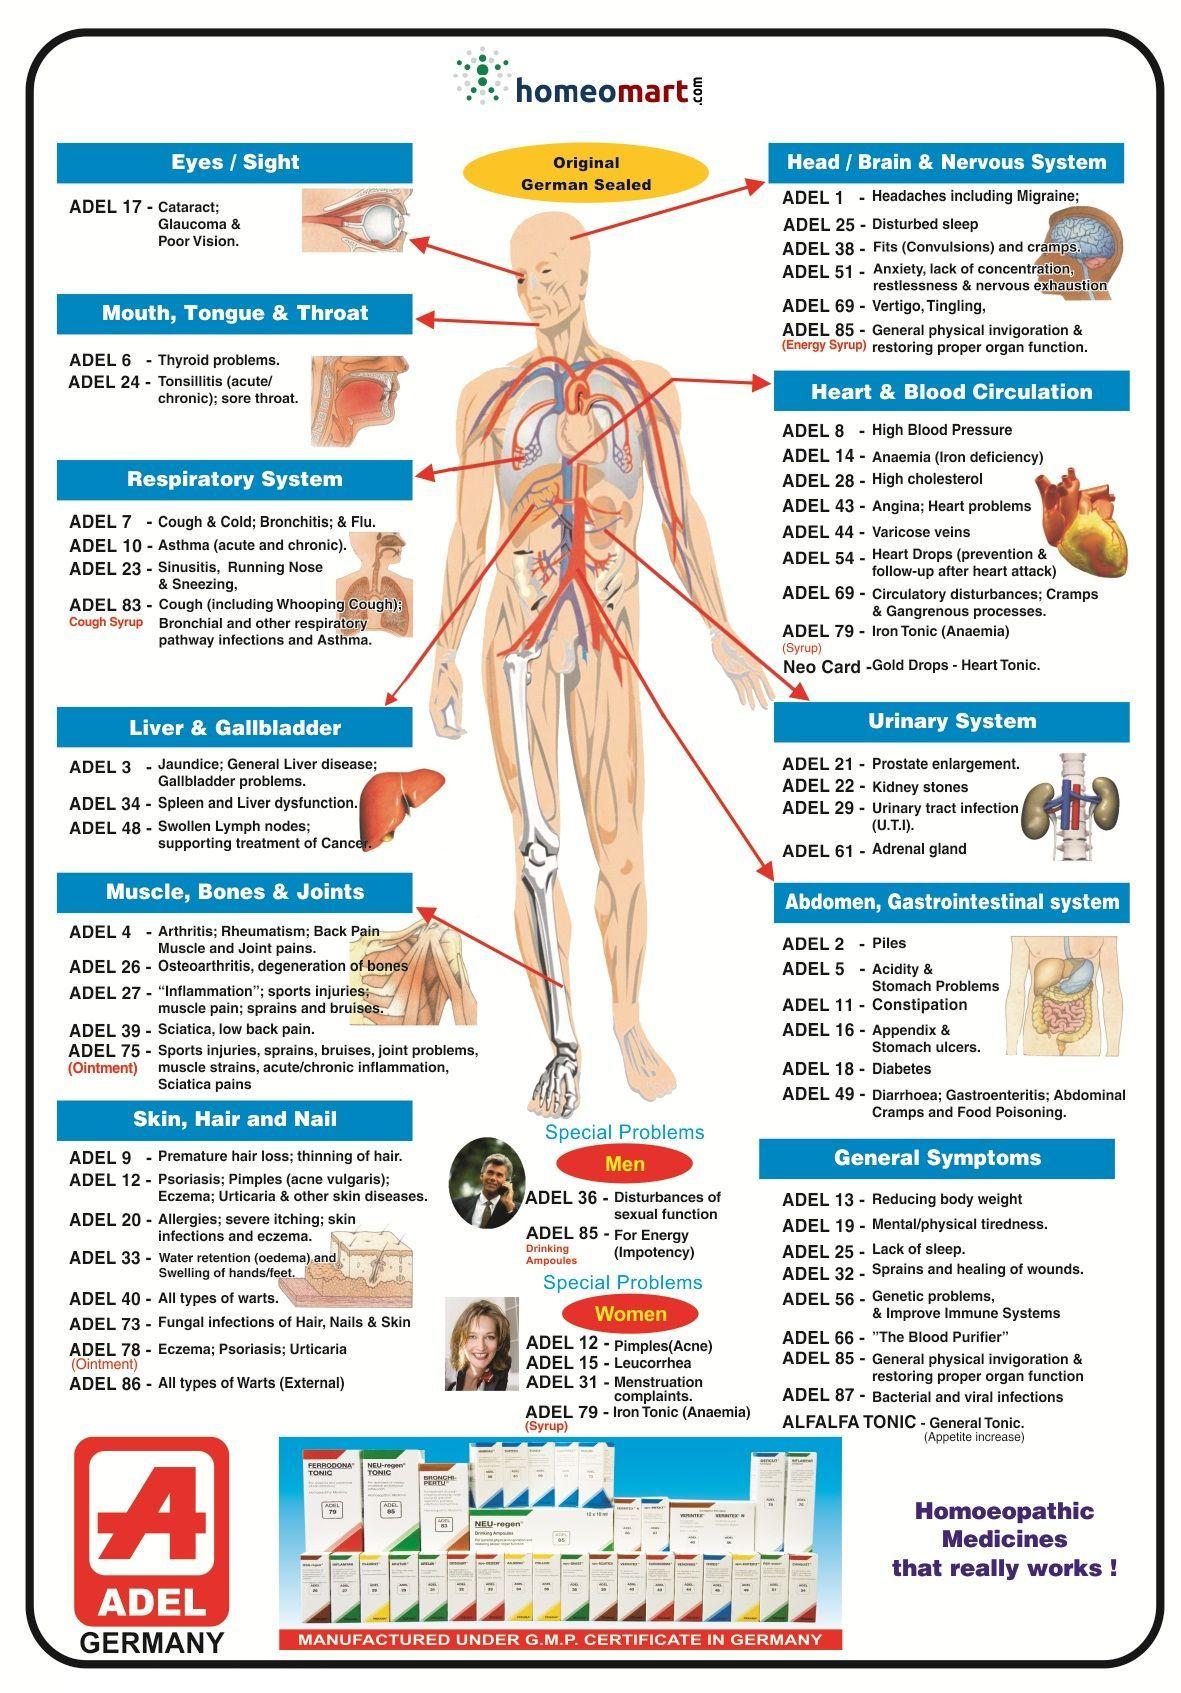 Adel Germany Homeopathy Medicine List Buy Online Get Upto 15 Off